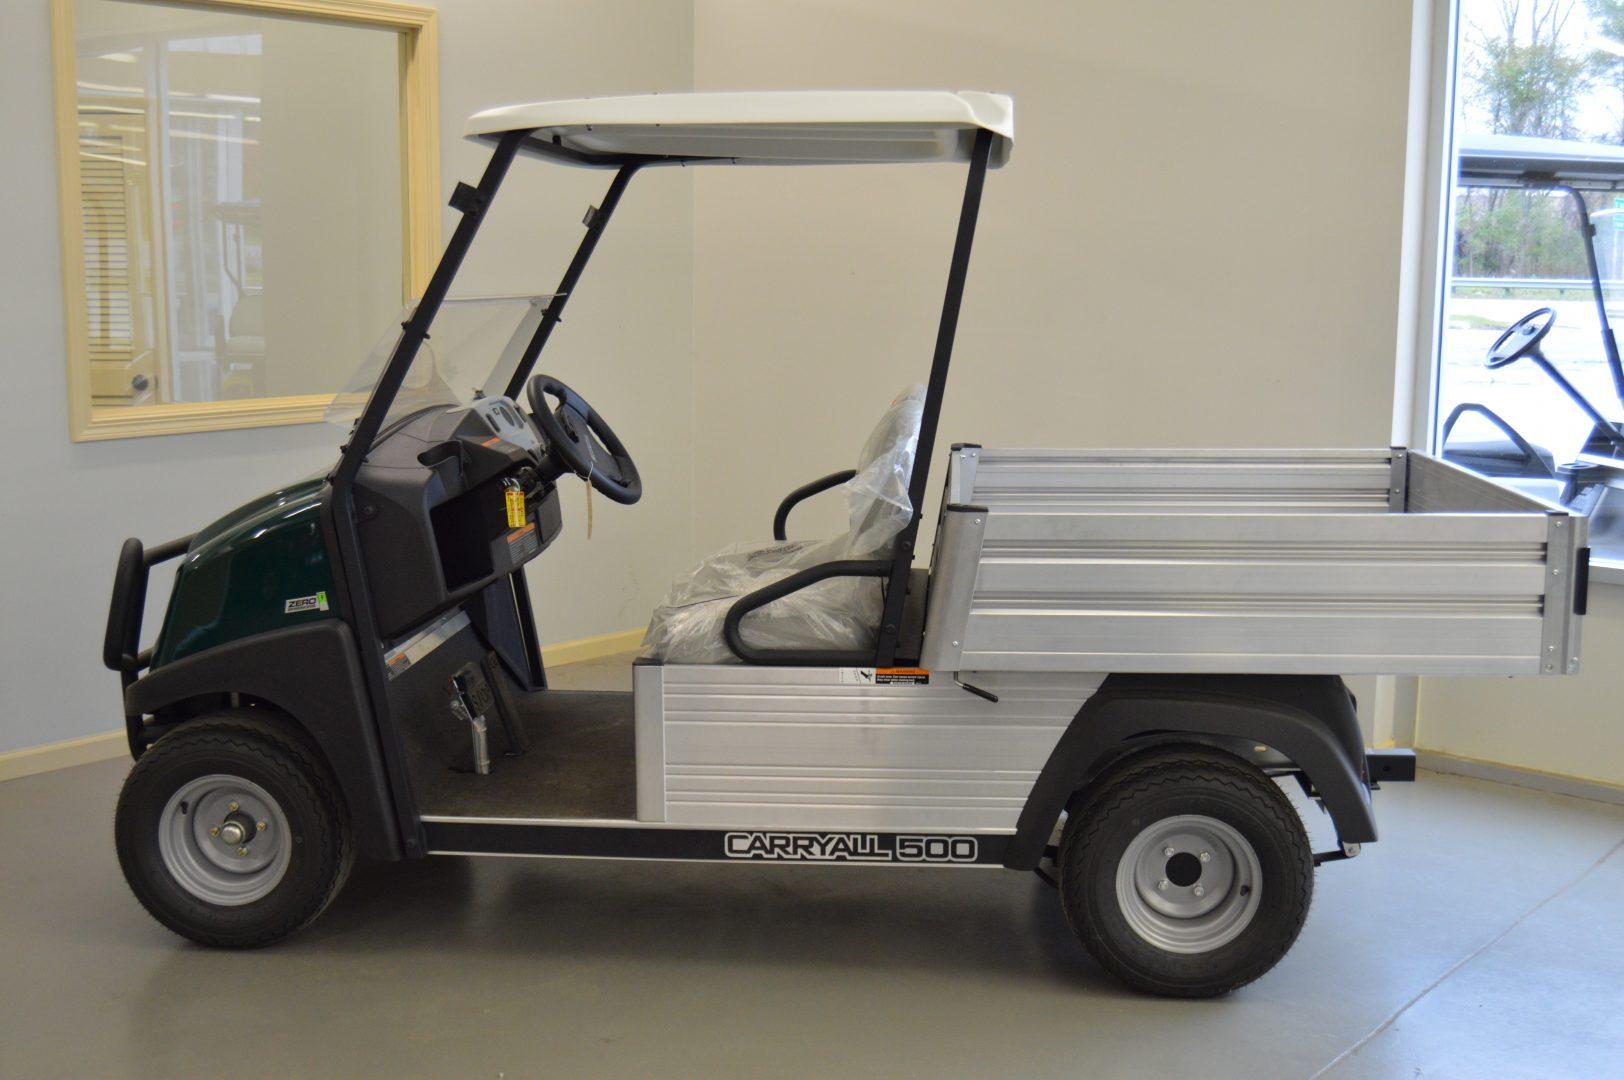 2016 Club Car Carryall 500 Electric Wiers Golf Carts